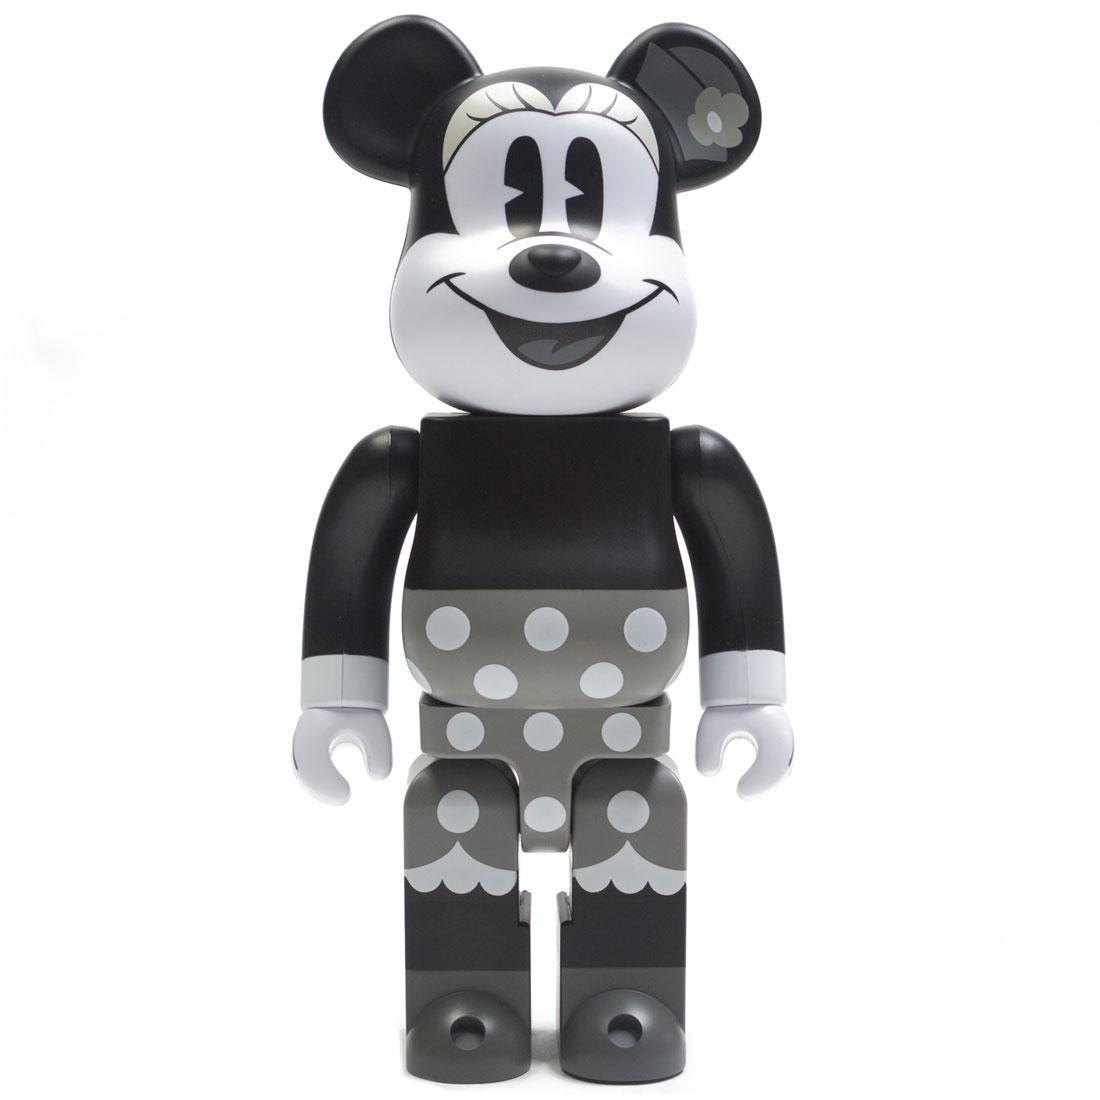 Medicom Disney Minnie Mouse Black And White Ver 400% Bearbrick Figure (black / white)